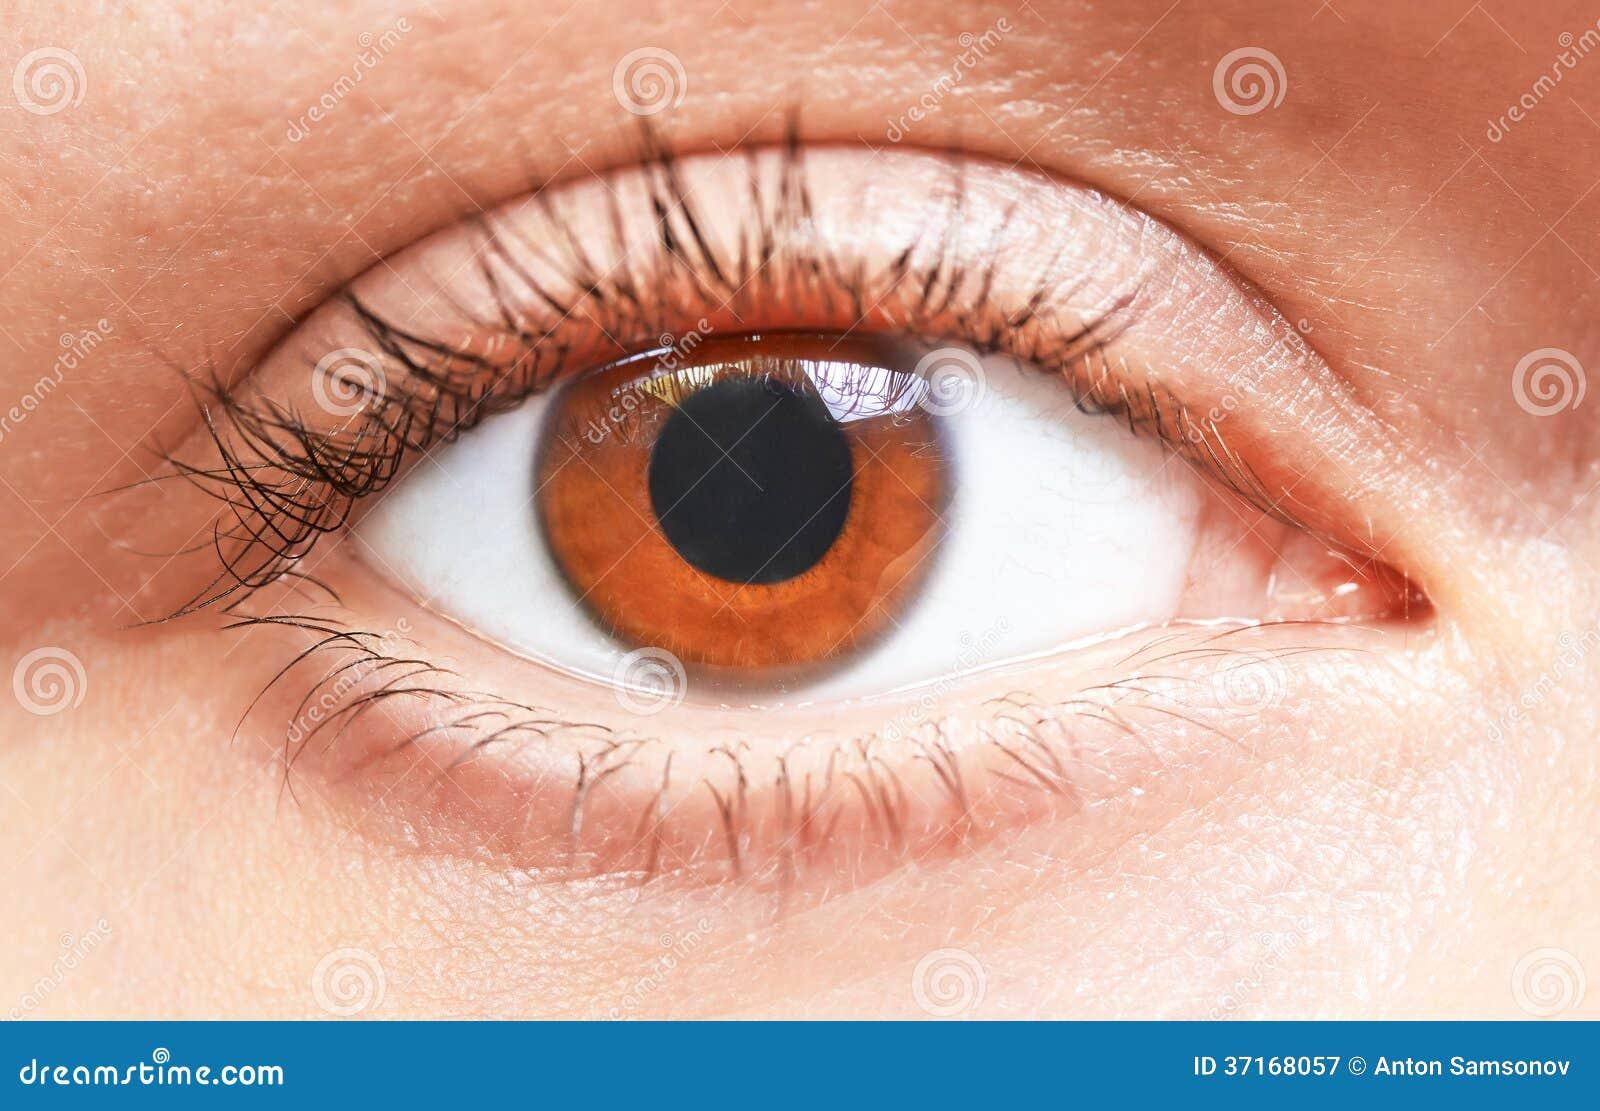 Brown Eyes Girl Stock Image. Image Of Female Healthy - 37168057